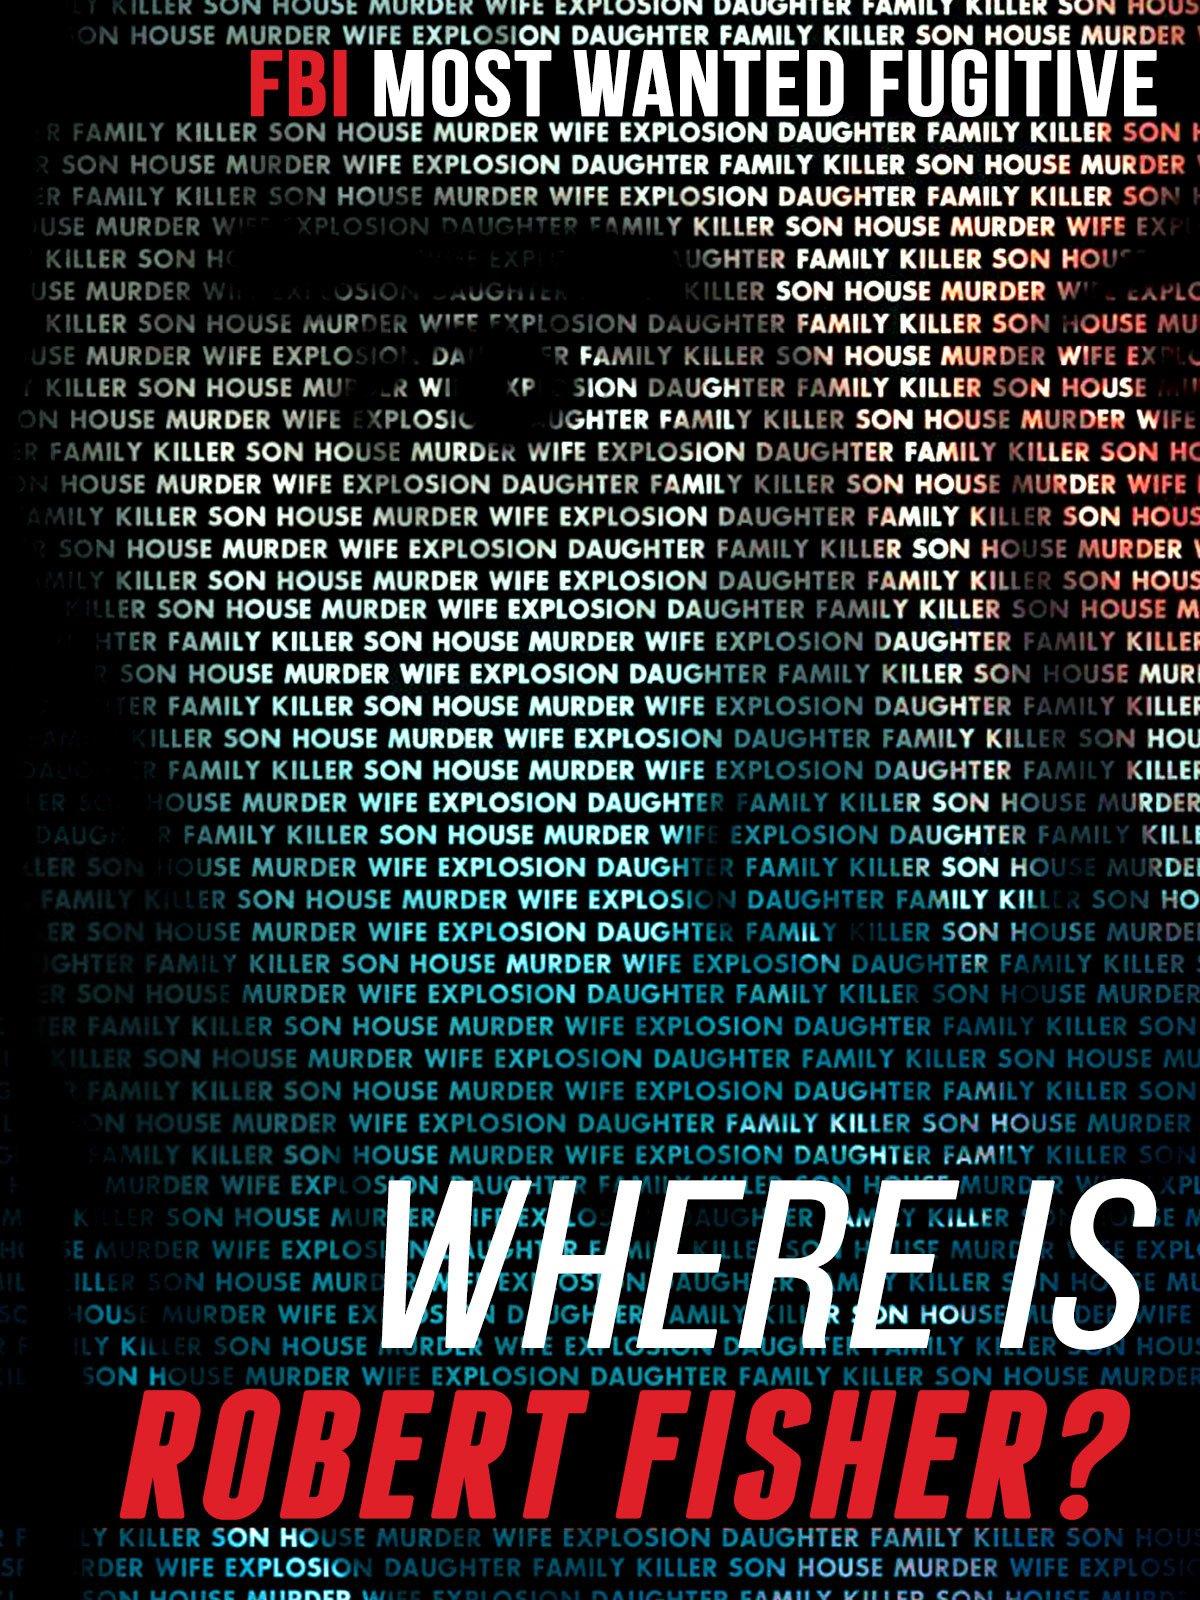 Amazon.com: Where Is Robert Fisher?: Robert Caldwell, John Hook ...